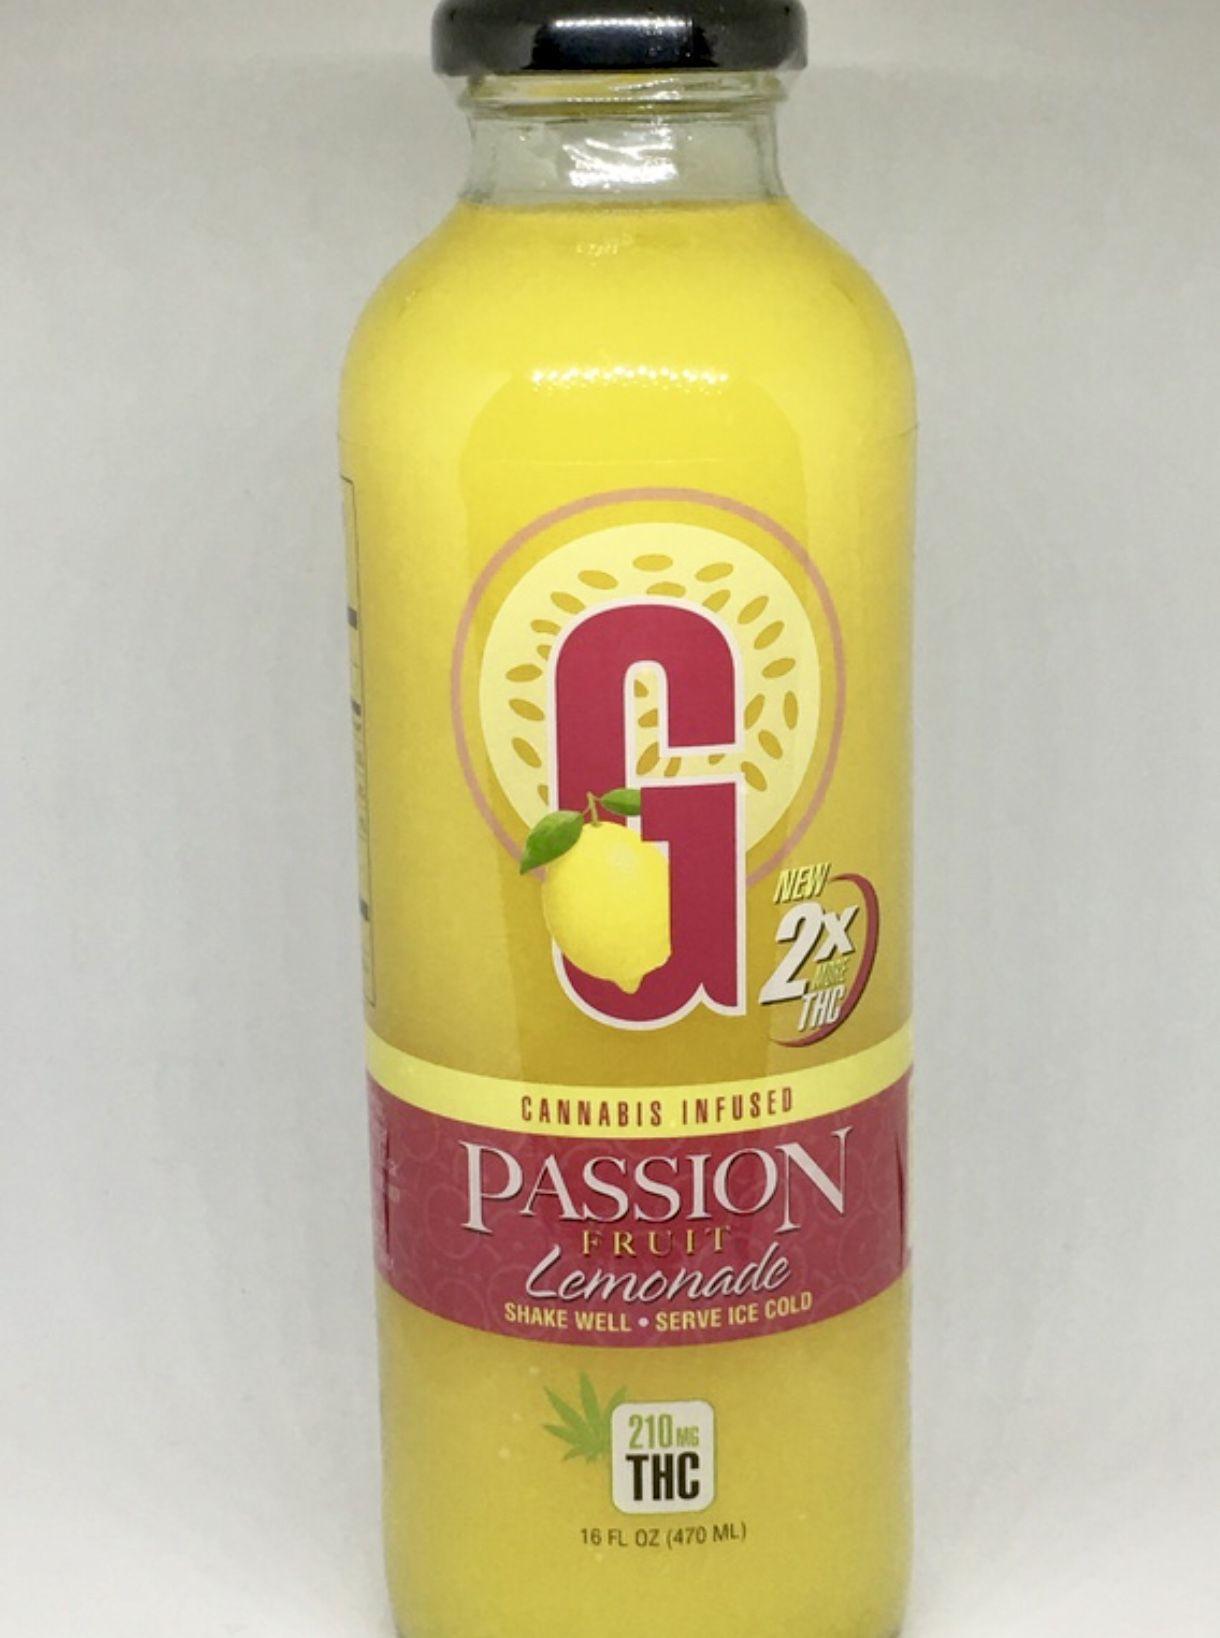 G-Drinks Passion Fruit Lemonade flavor (210mg THC)